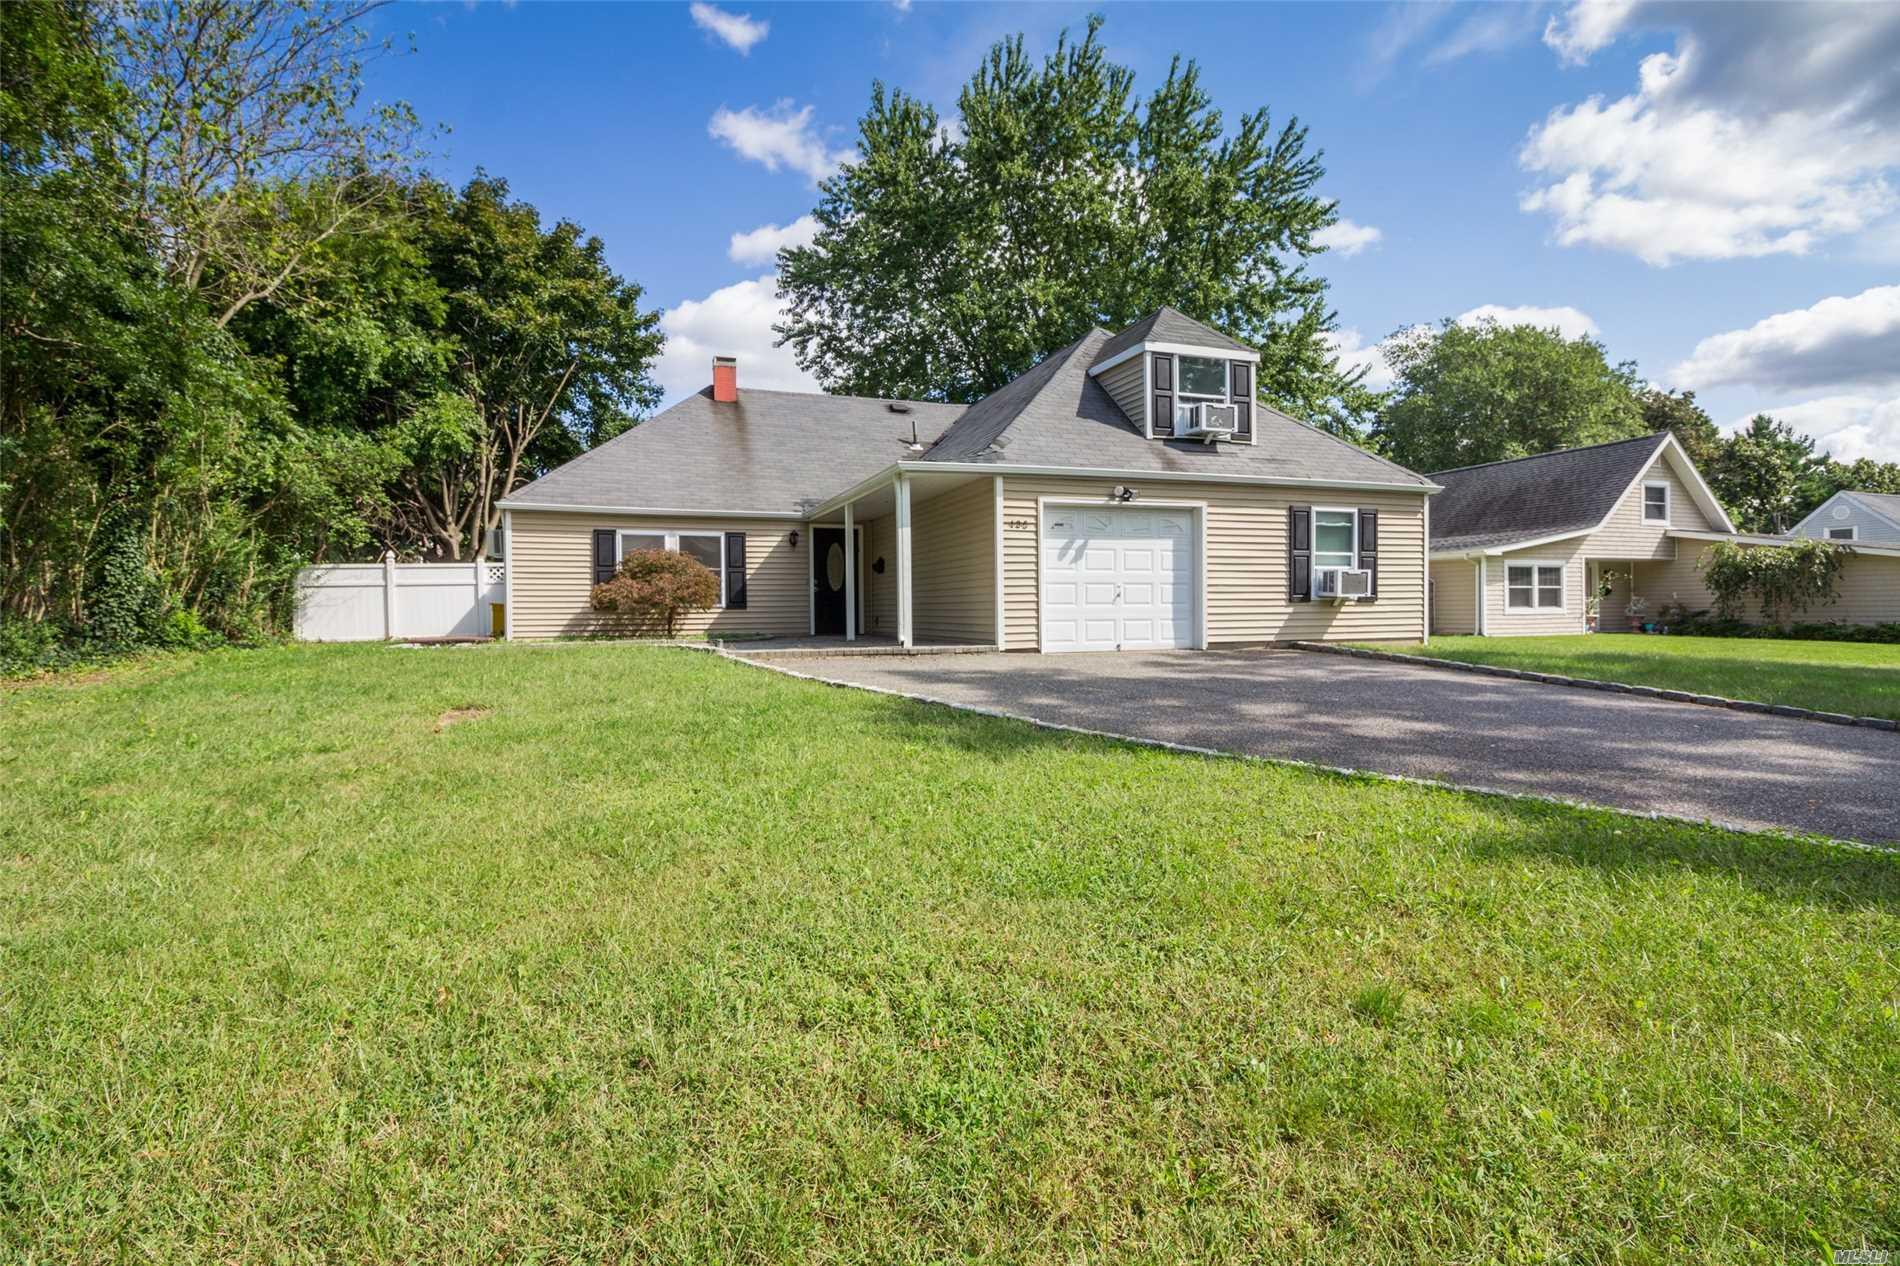 Photo of home for sale at 135 Split Cedar Dr, Islandia NY